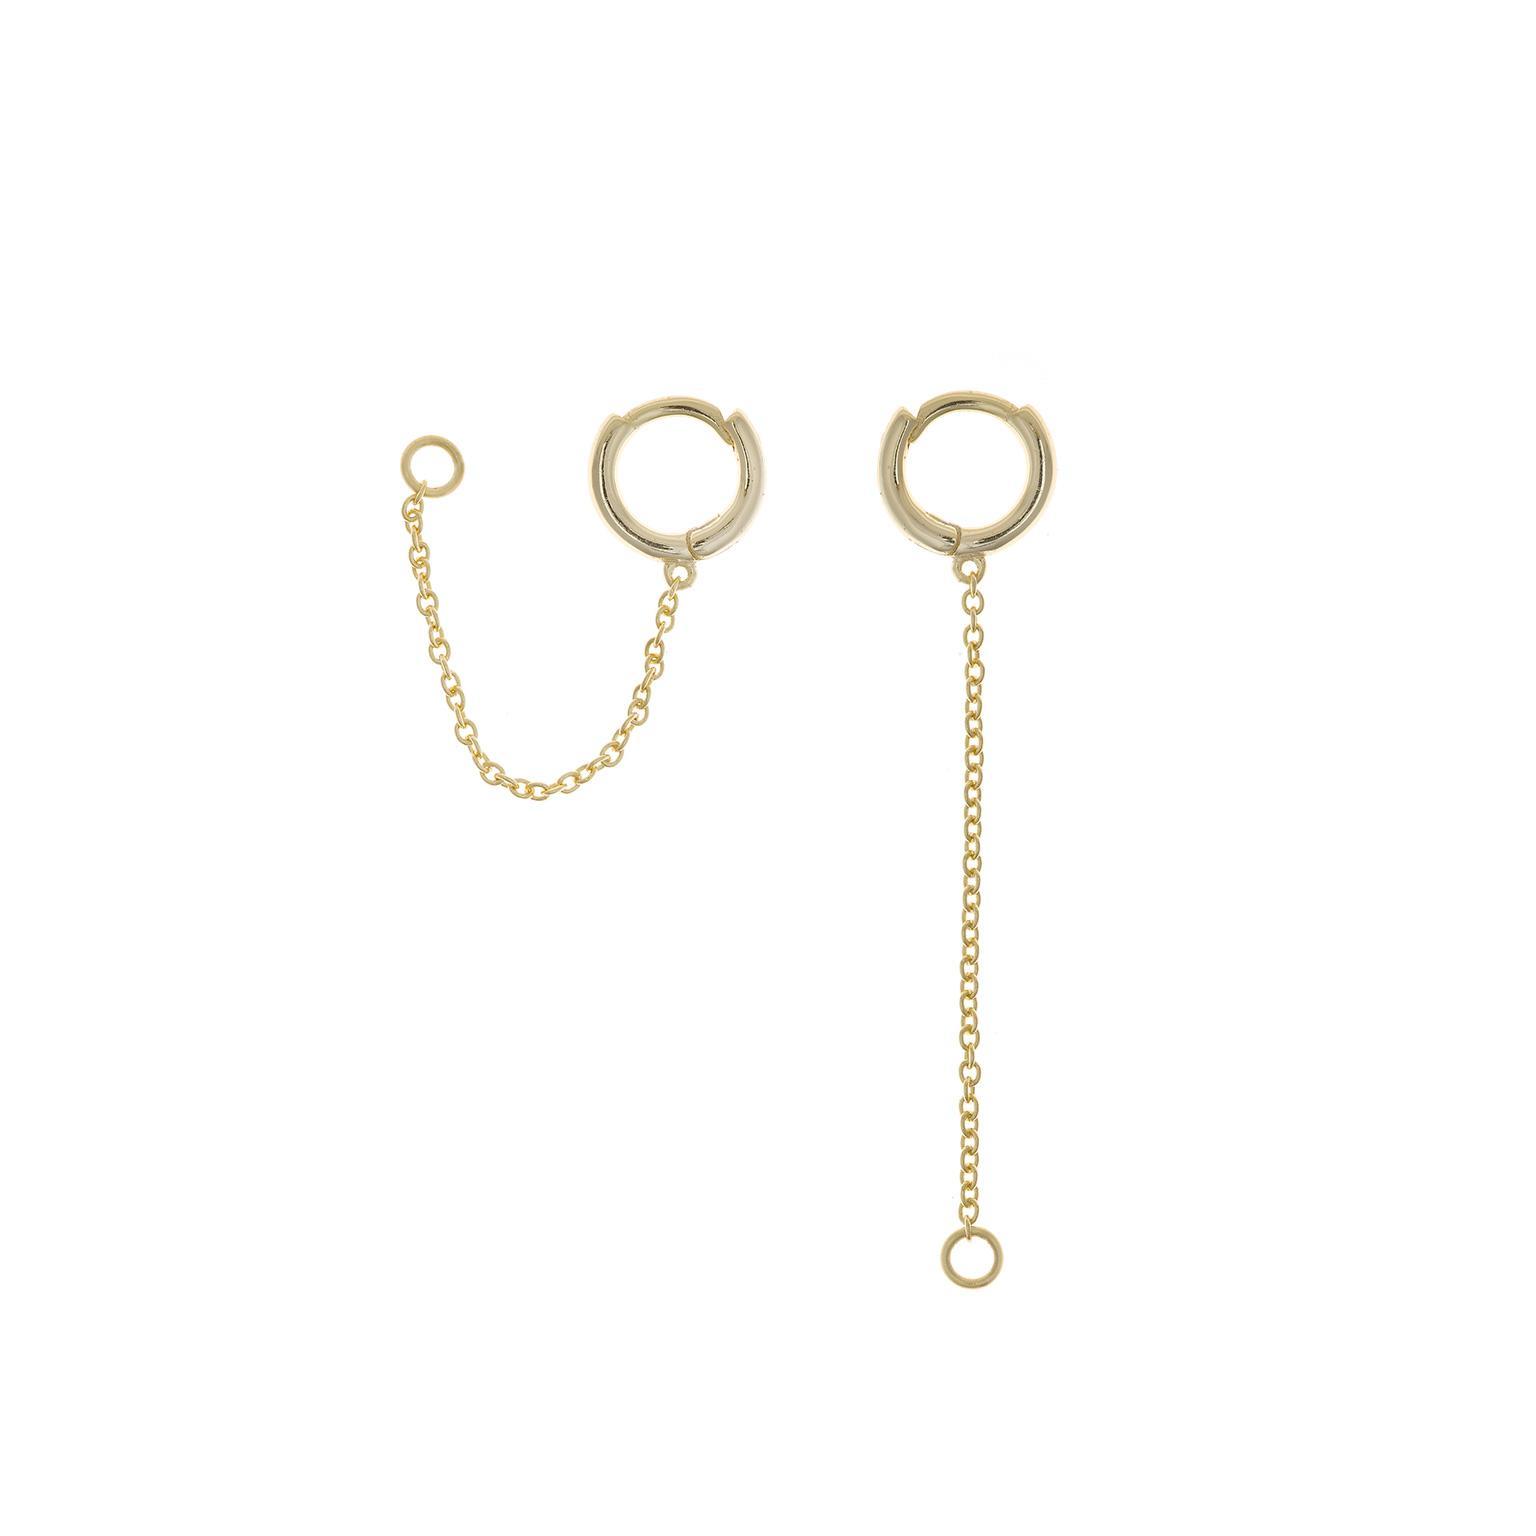 Charm  plata Salvatore cadena con aro  dorados tamaño XS